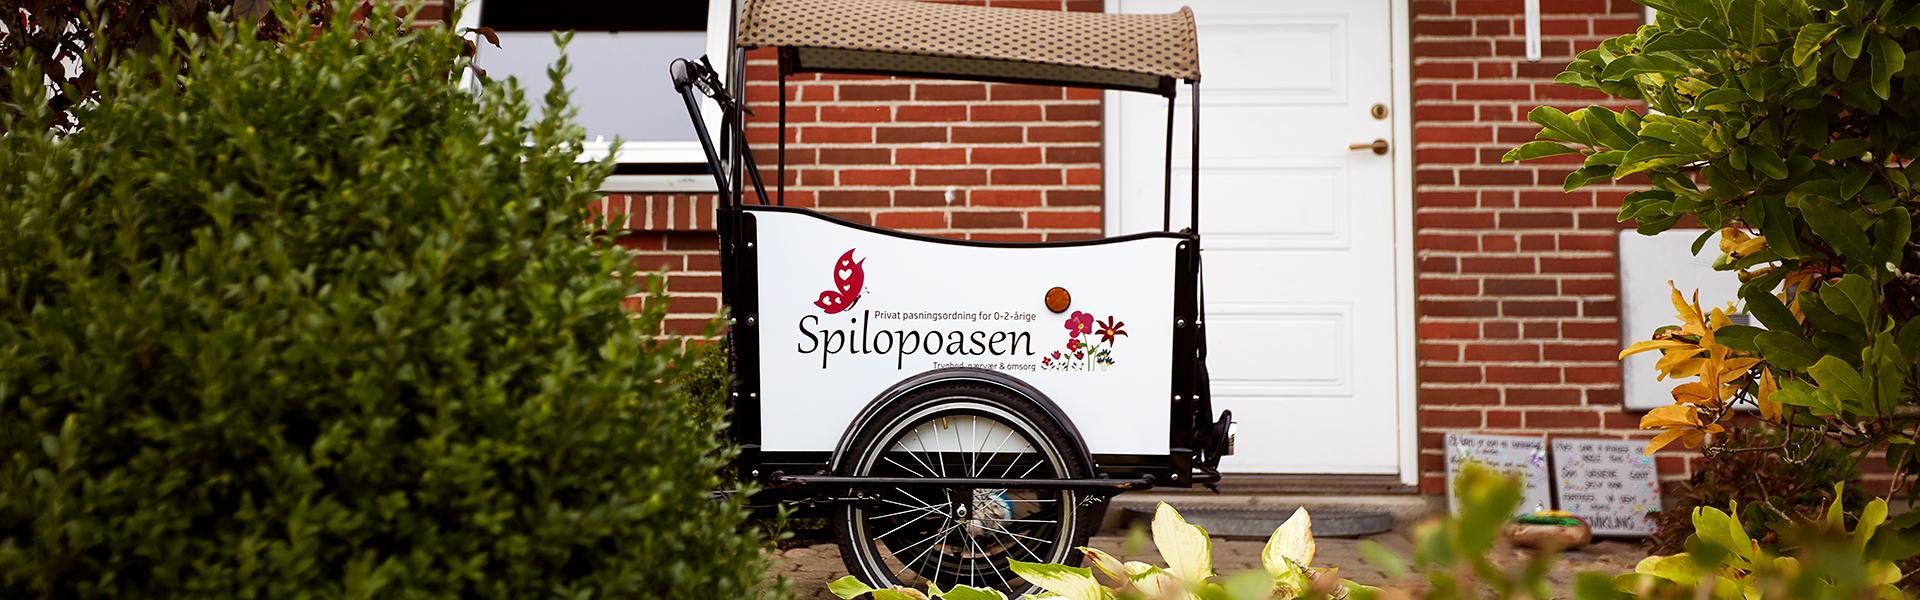 cykel-spilopoasen